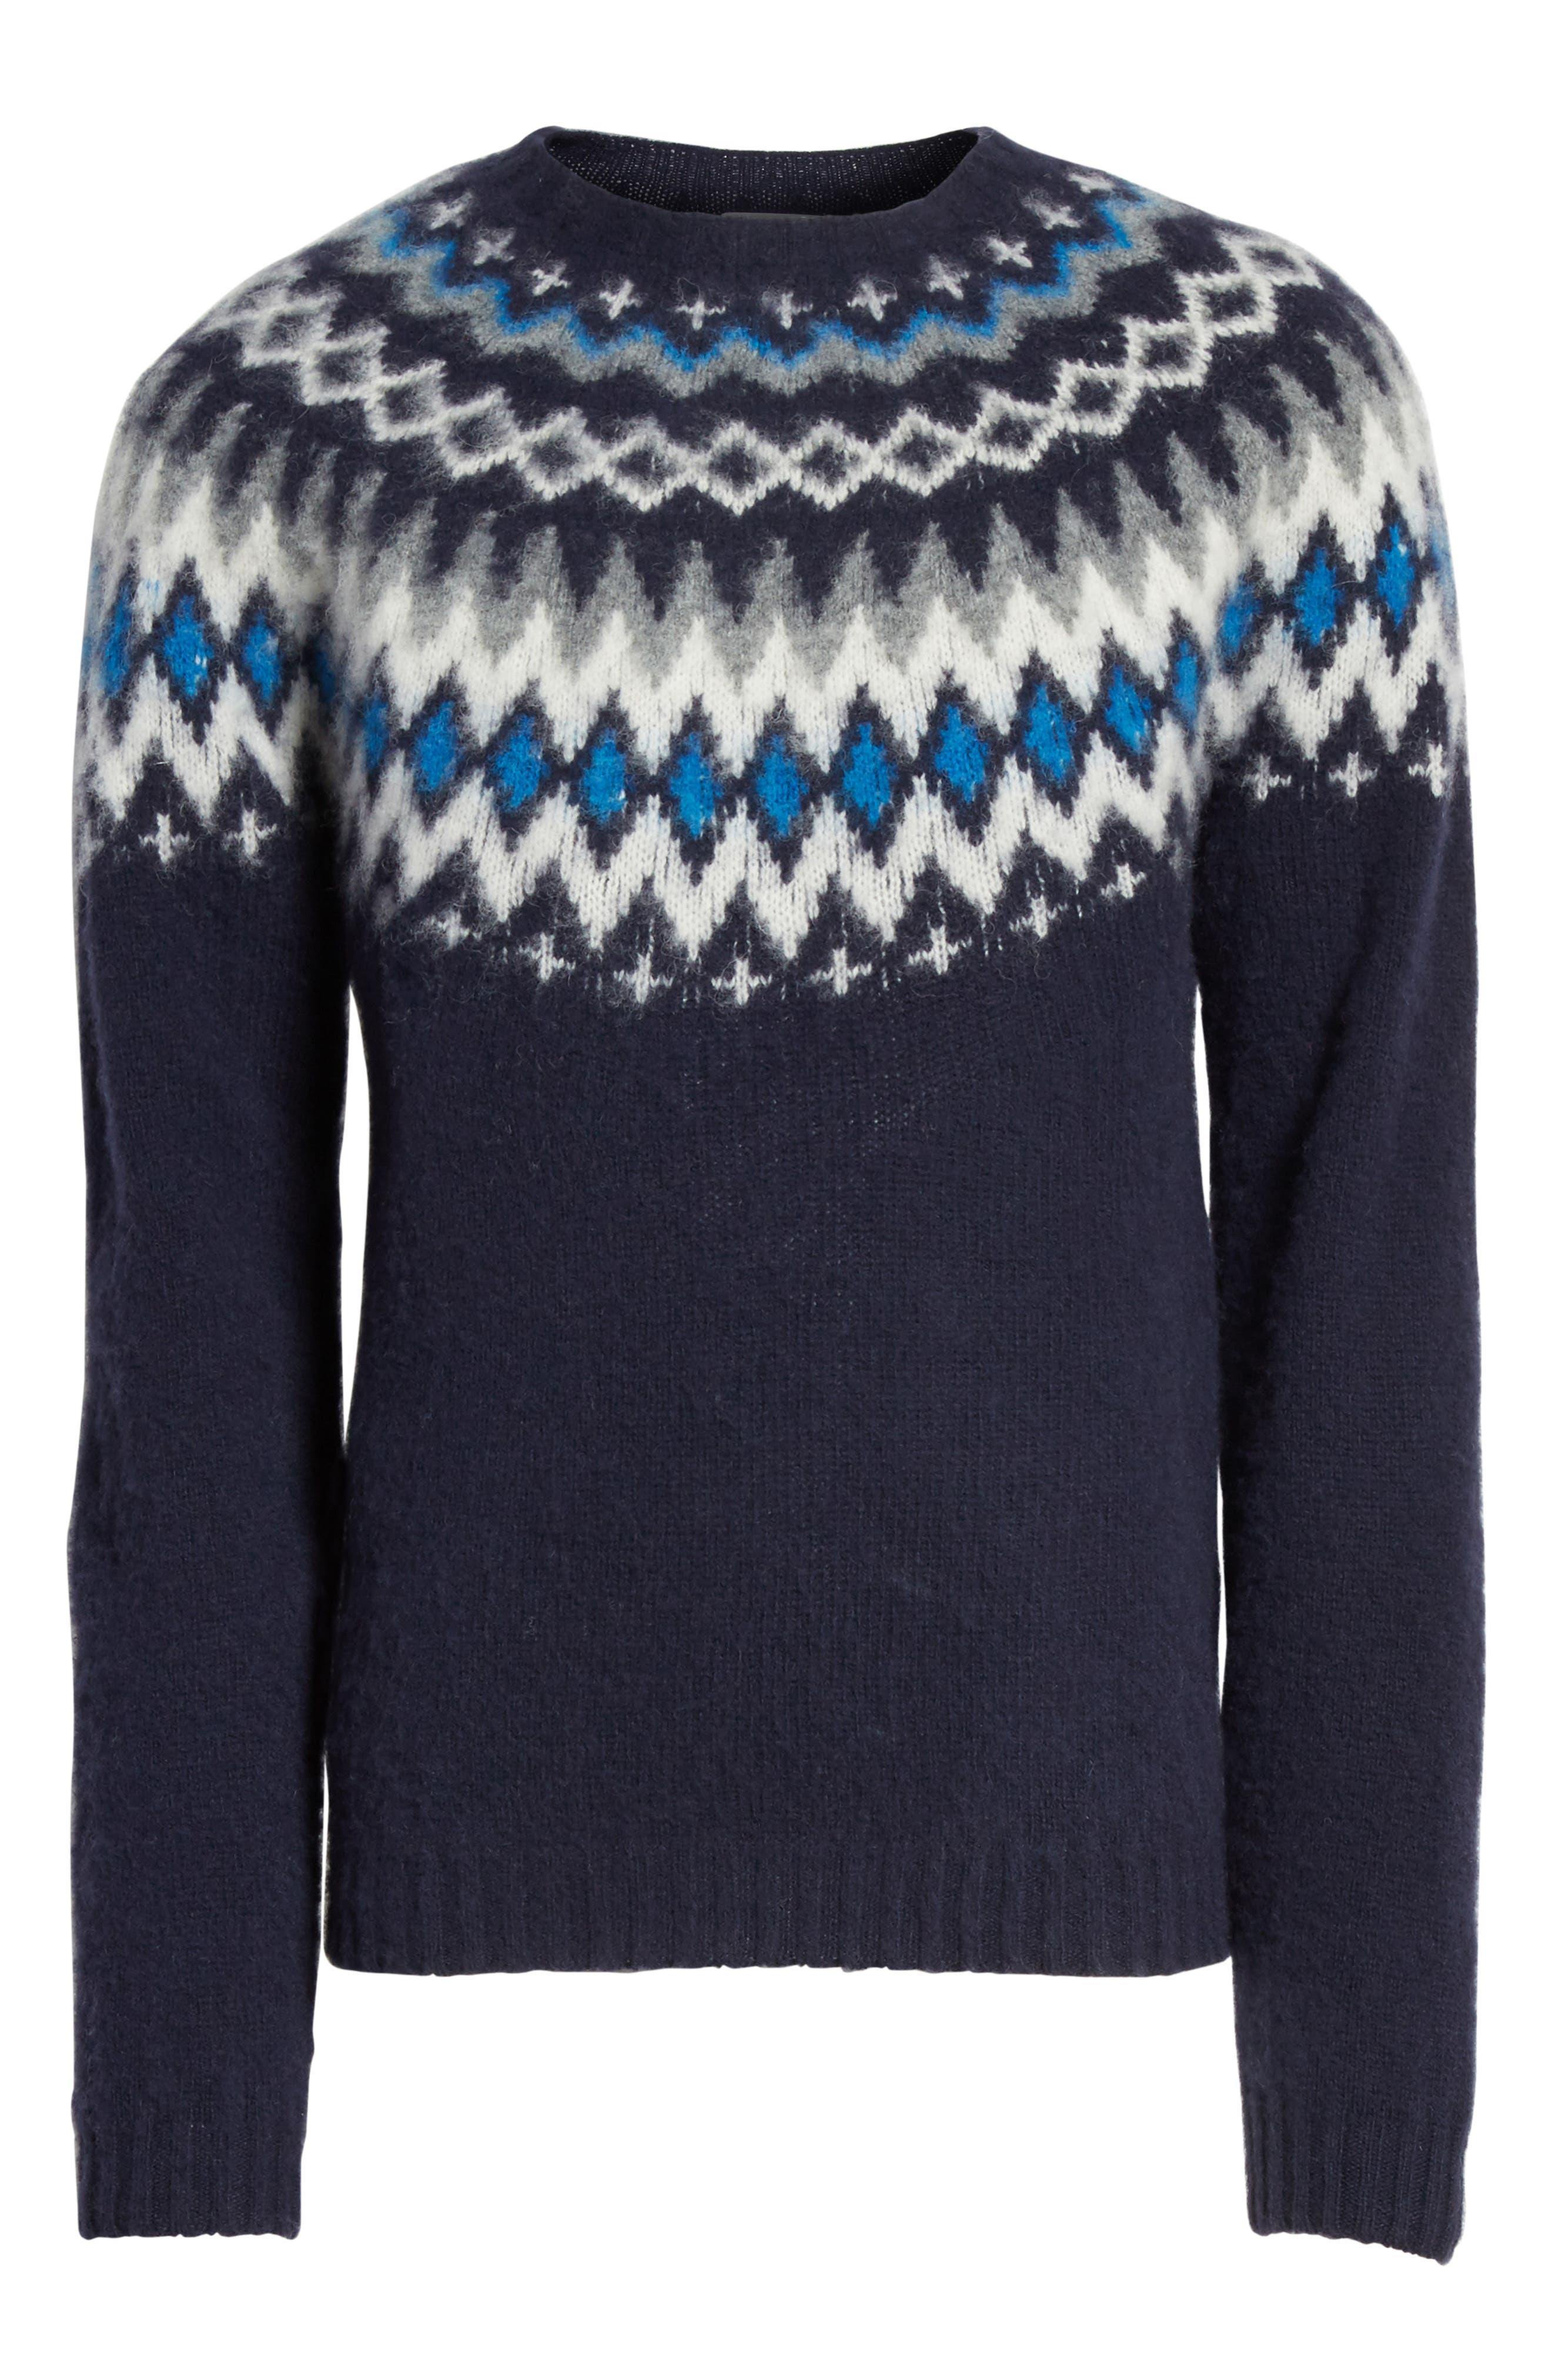 Nirnir Fair Isle Lambswool Sweater,                             Alternate thumbnail 6, color,                             410